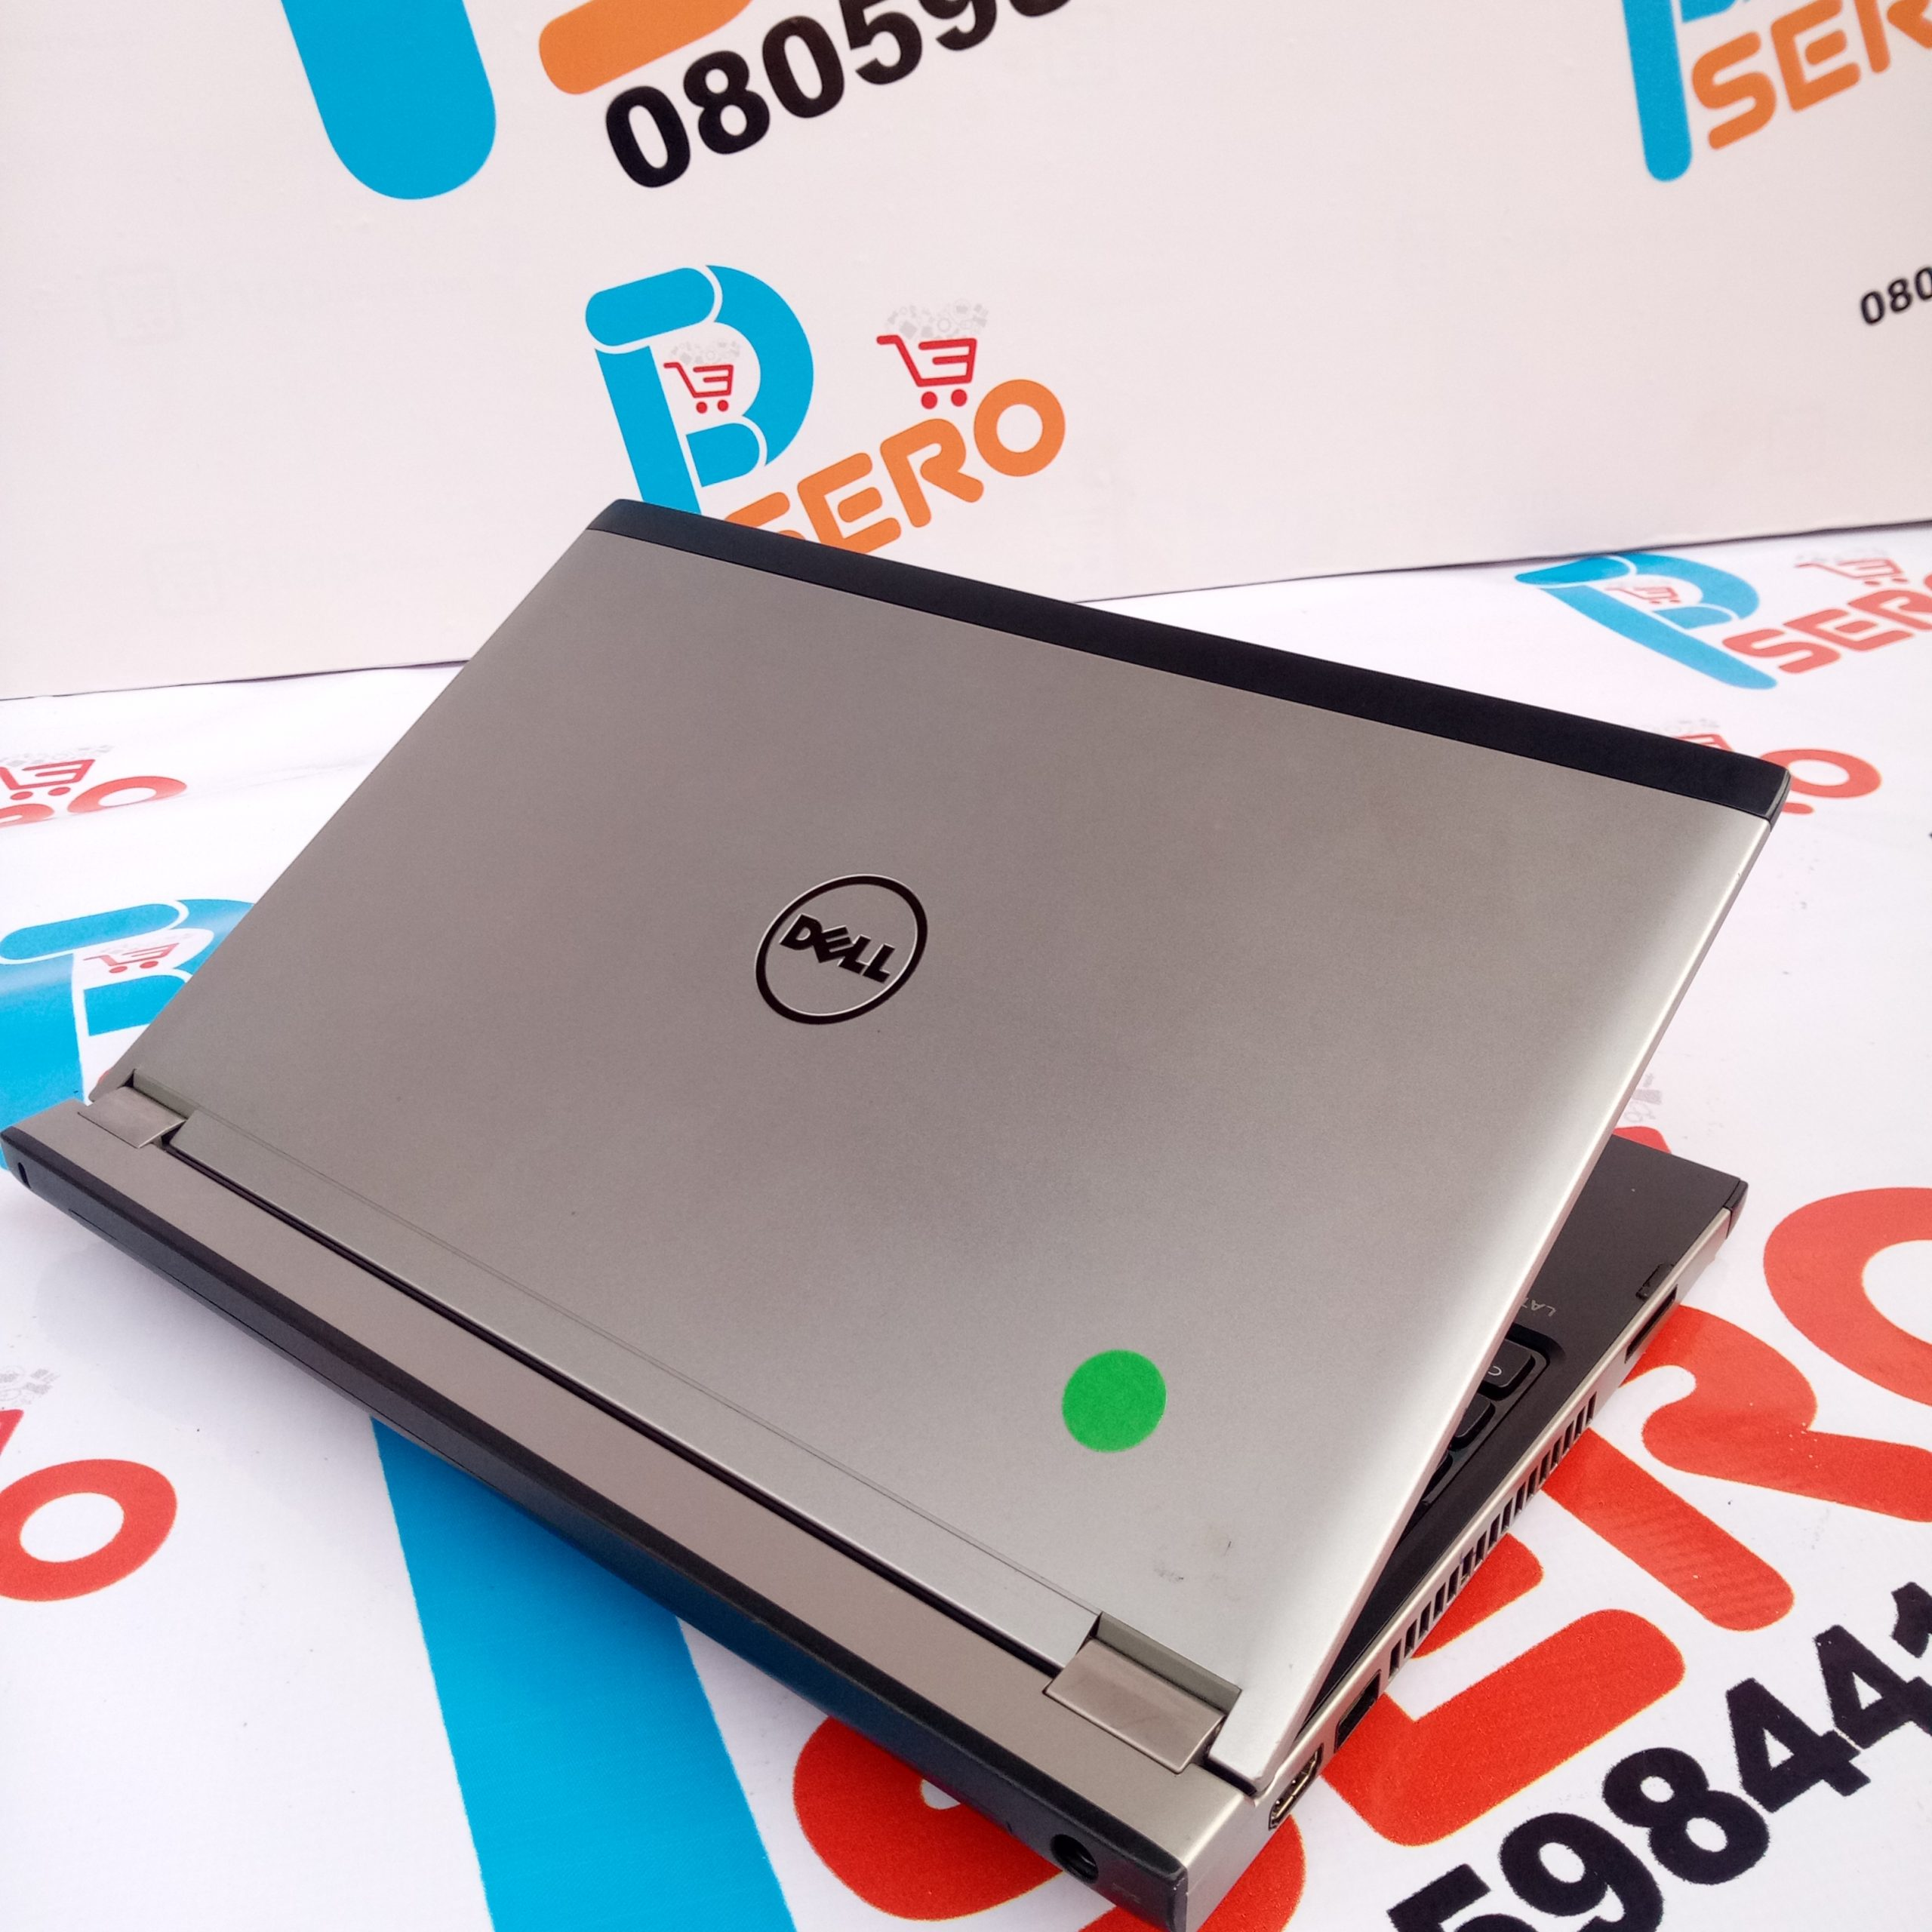 Uk Used Dell Latitude 3330 Laptop – Core i3 – 4GB Ram, 320GB Hard Drive